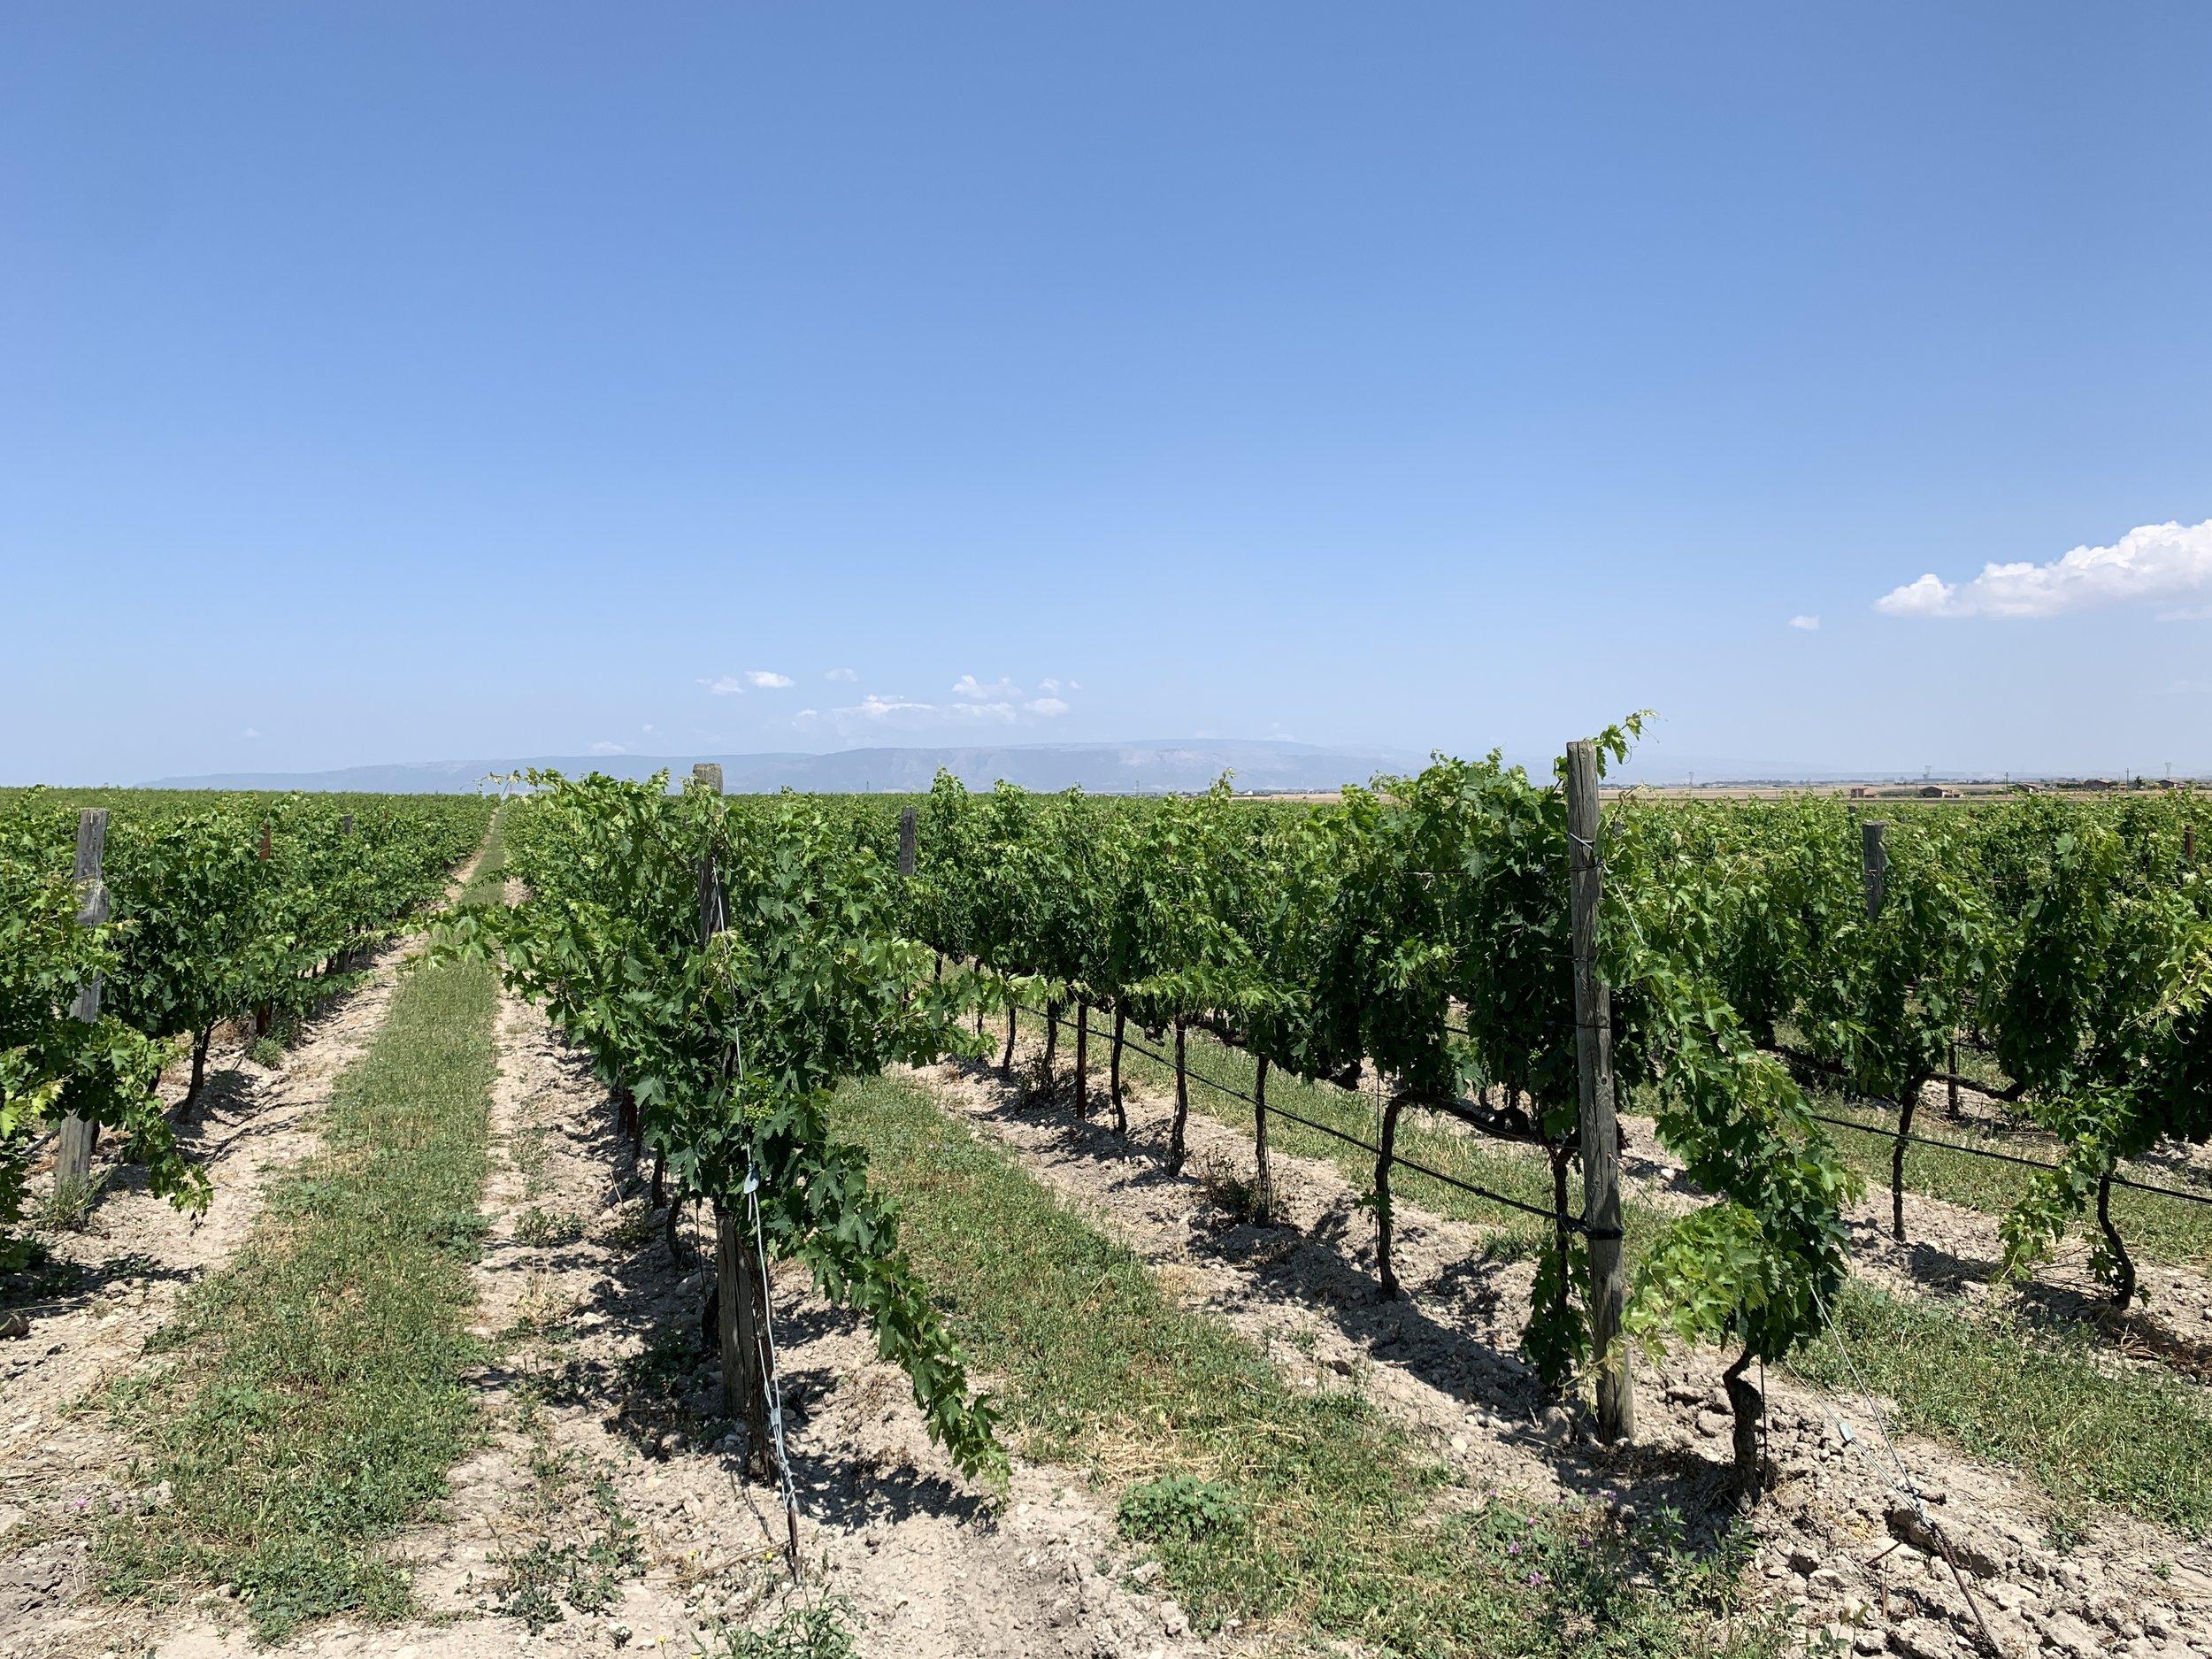 Vineyard behind Paolo Petrilli's home near Lucera, Puglia.